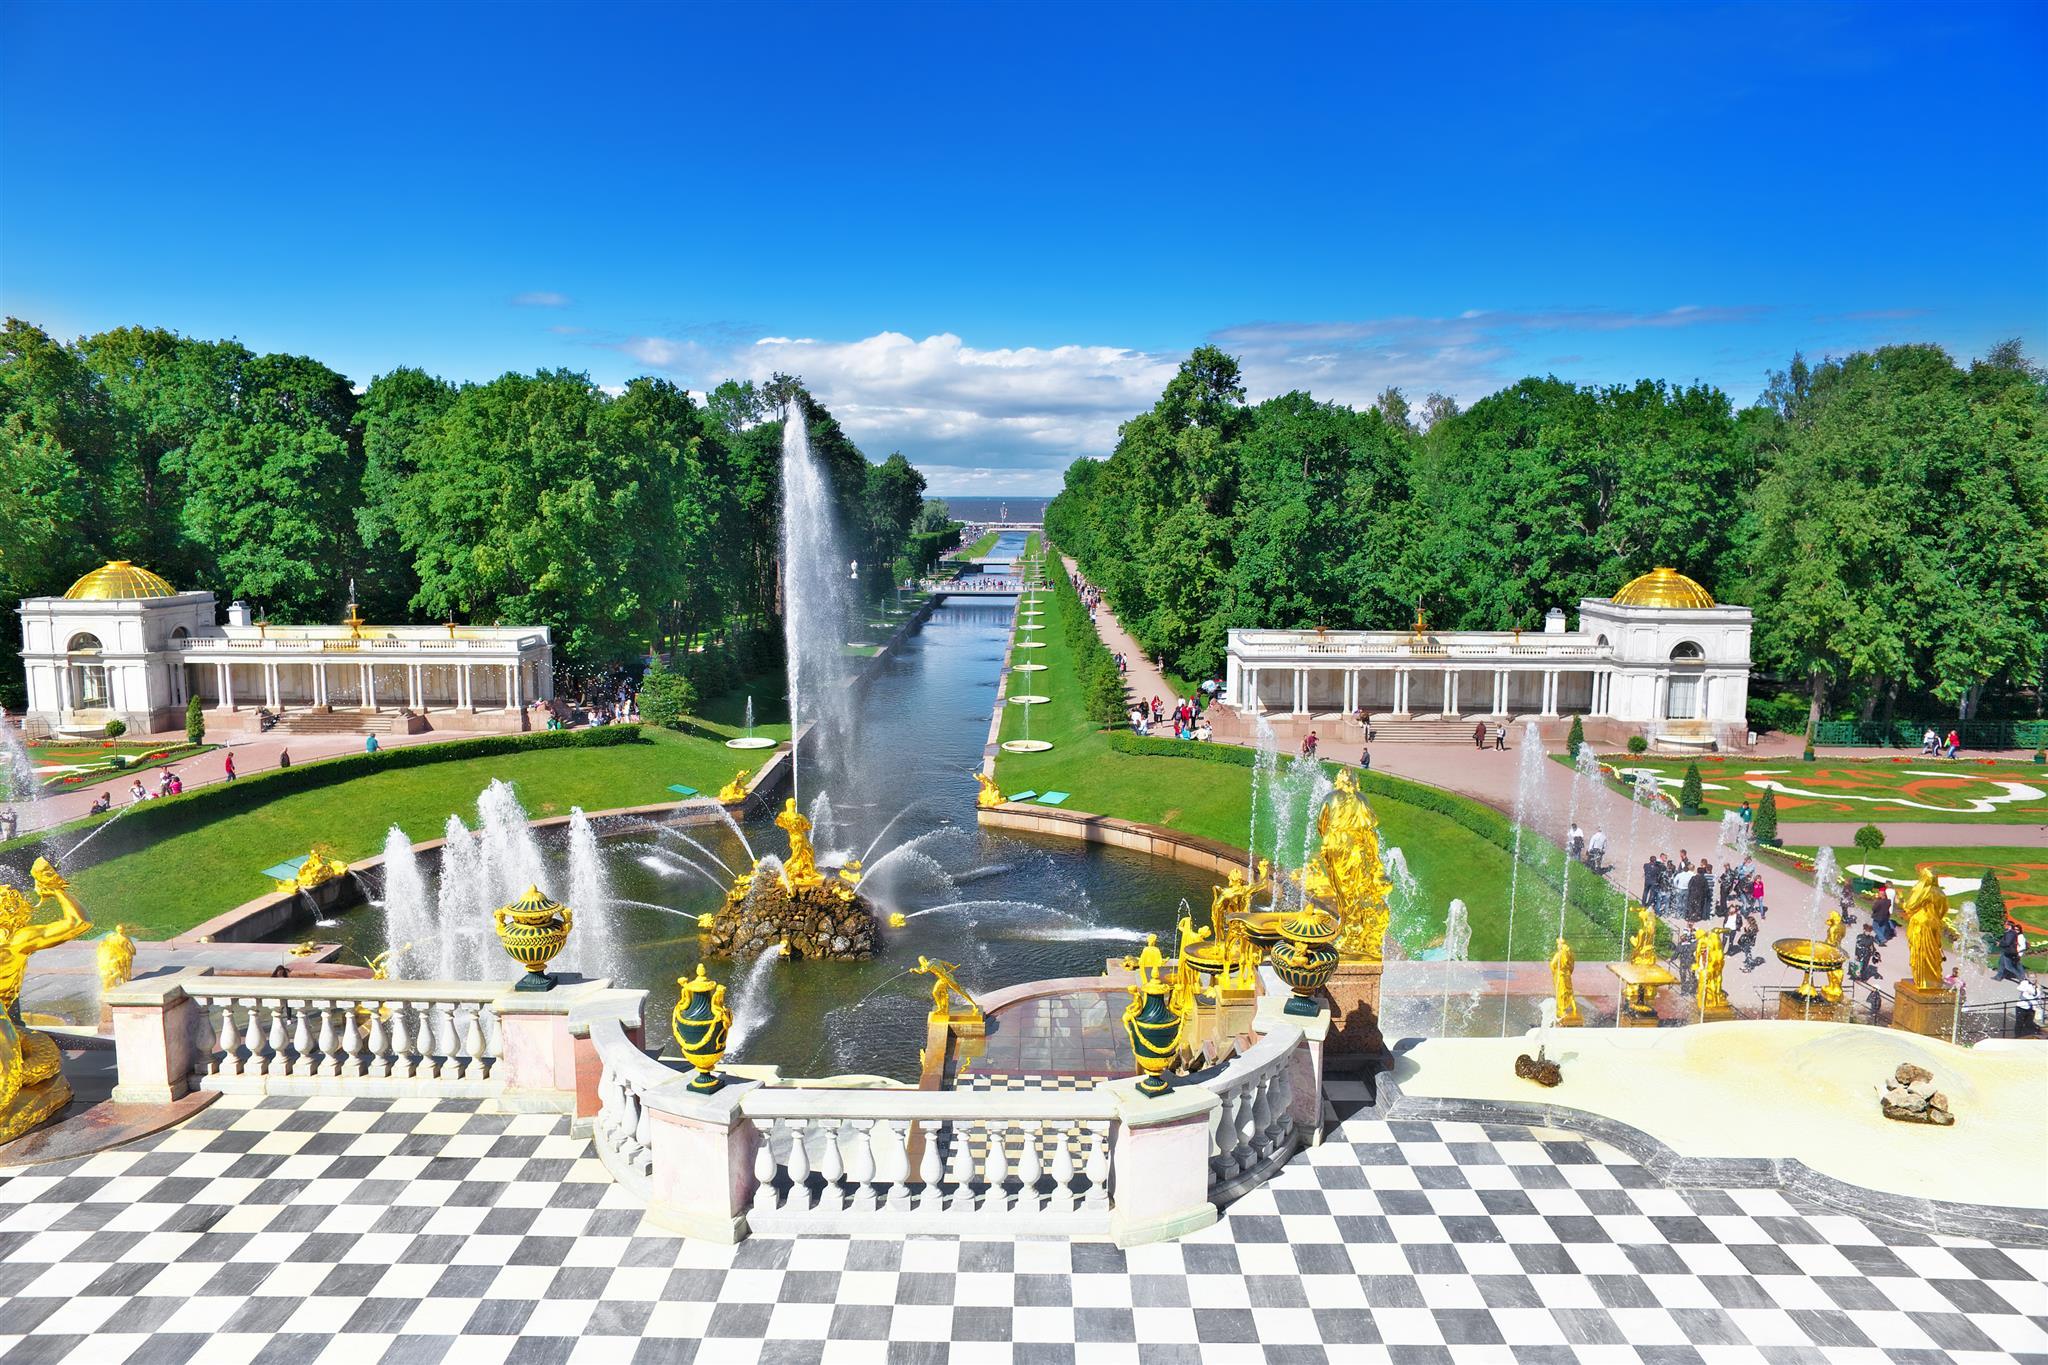 Dreamstime © - Saint-Pétersbourg - Peterhof - Jardins et fontaines (8)